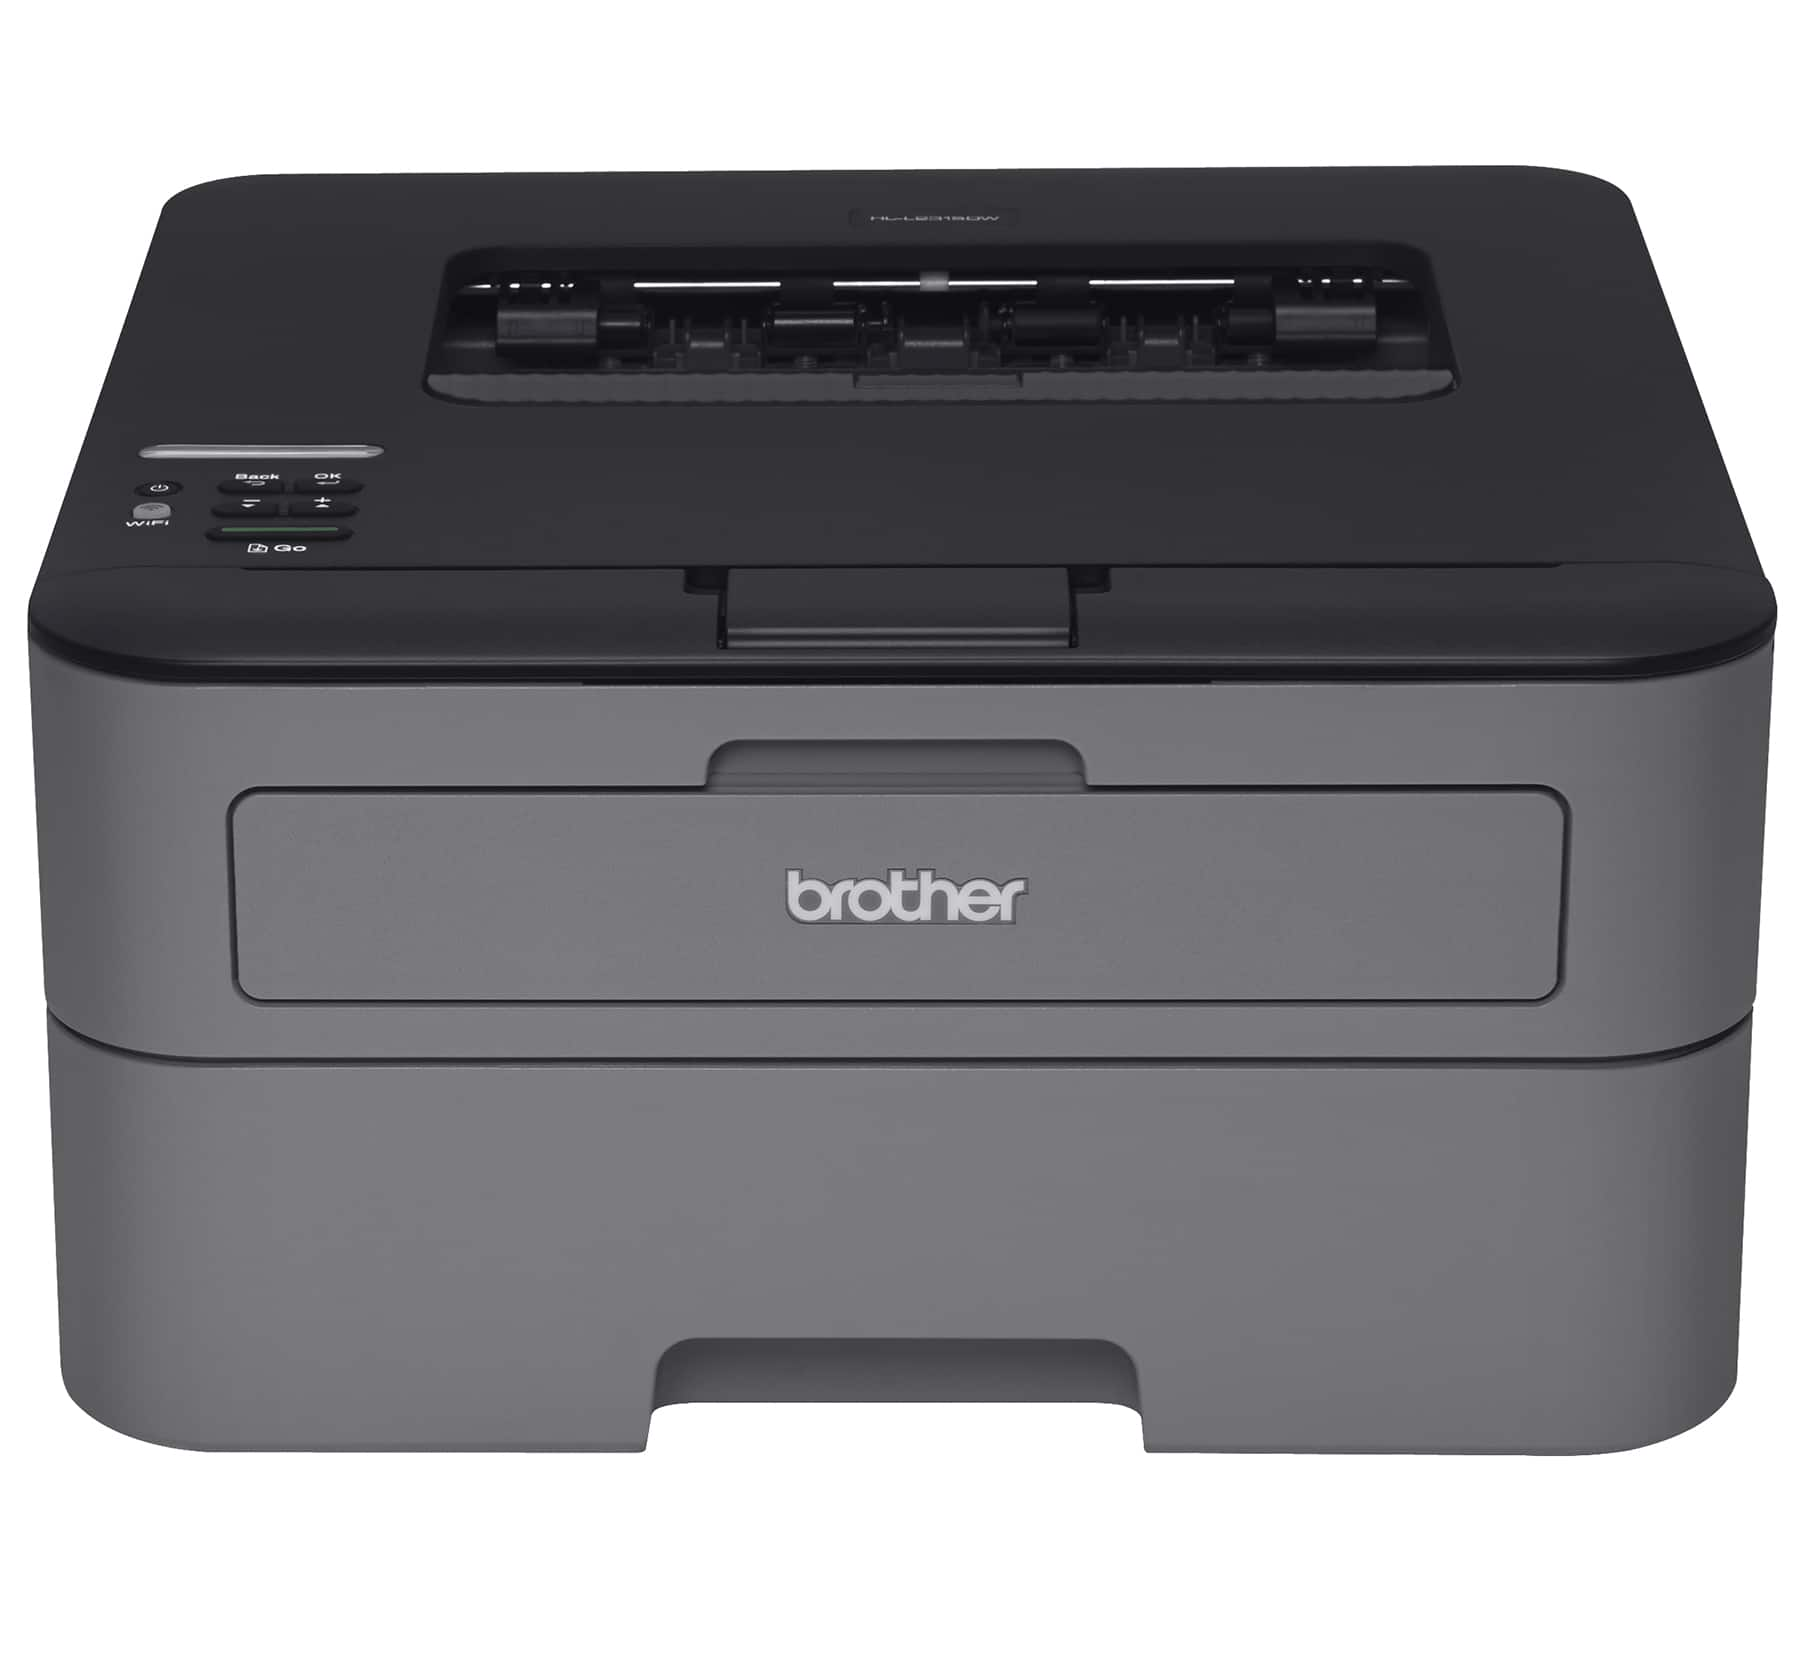 Brother Compact Monochrome Laser Printer, HL-L2315DW, Wireless Printing, Duplex Two-Sided Printing~$21 @ Walmart B+M~YMMV!